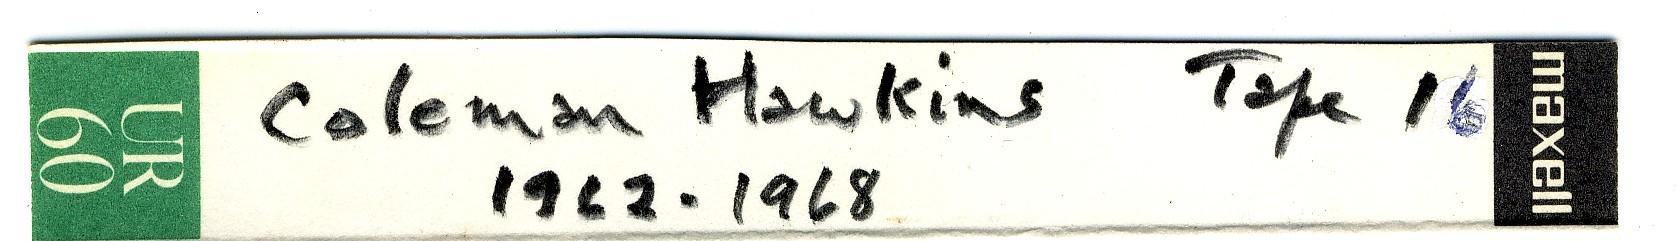 Coleman_Hawkins_Tape_16_1962-1968